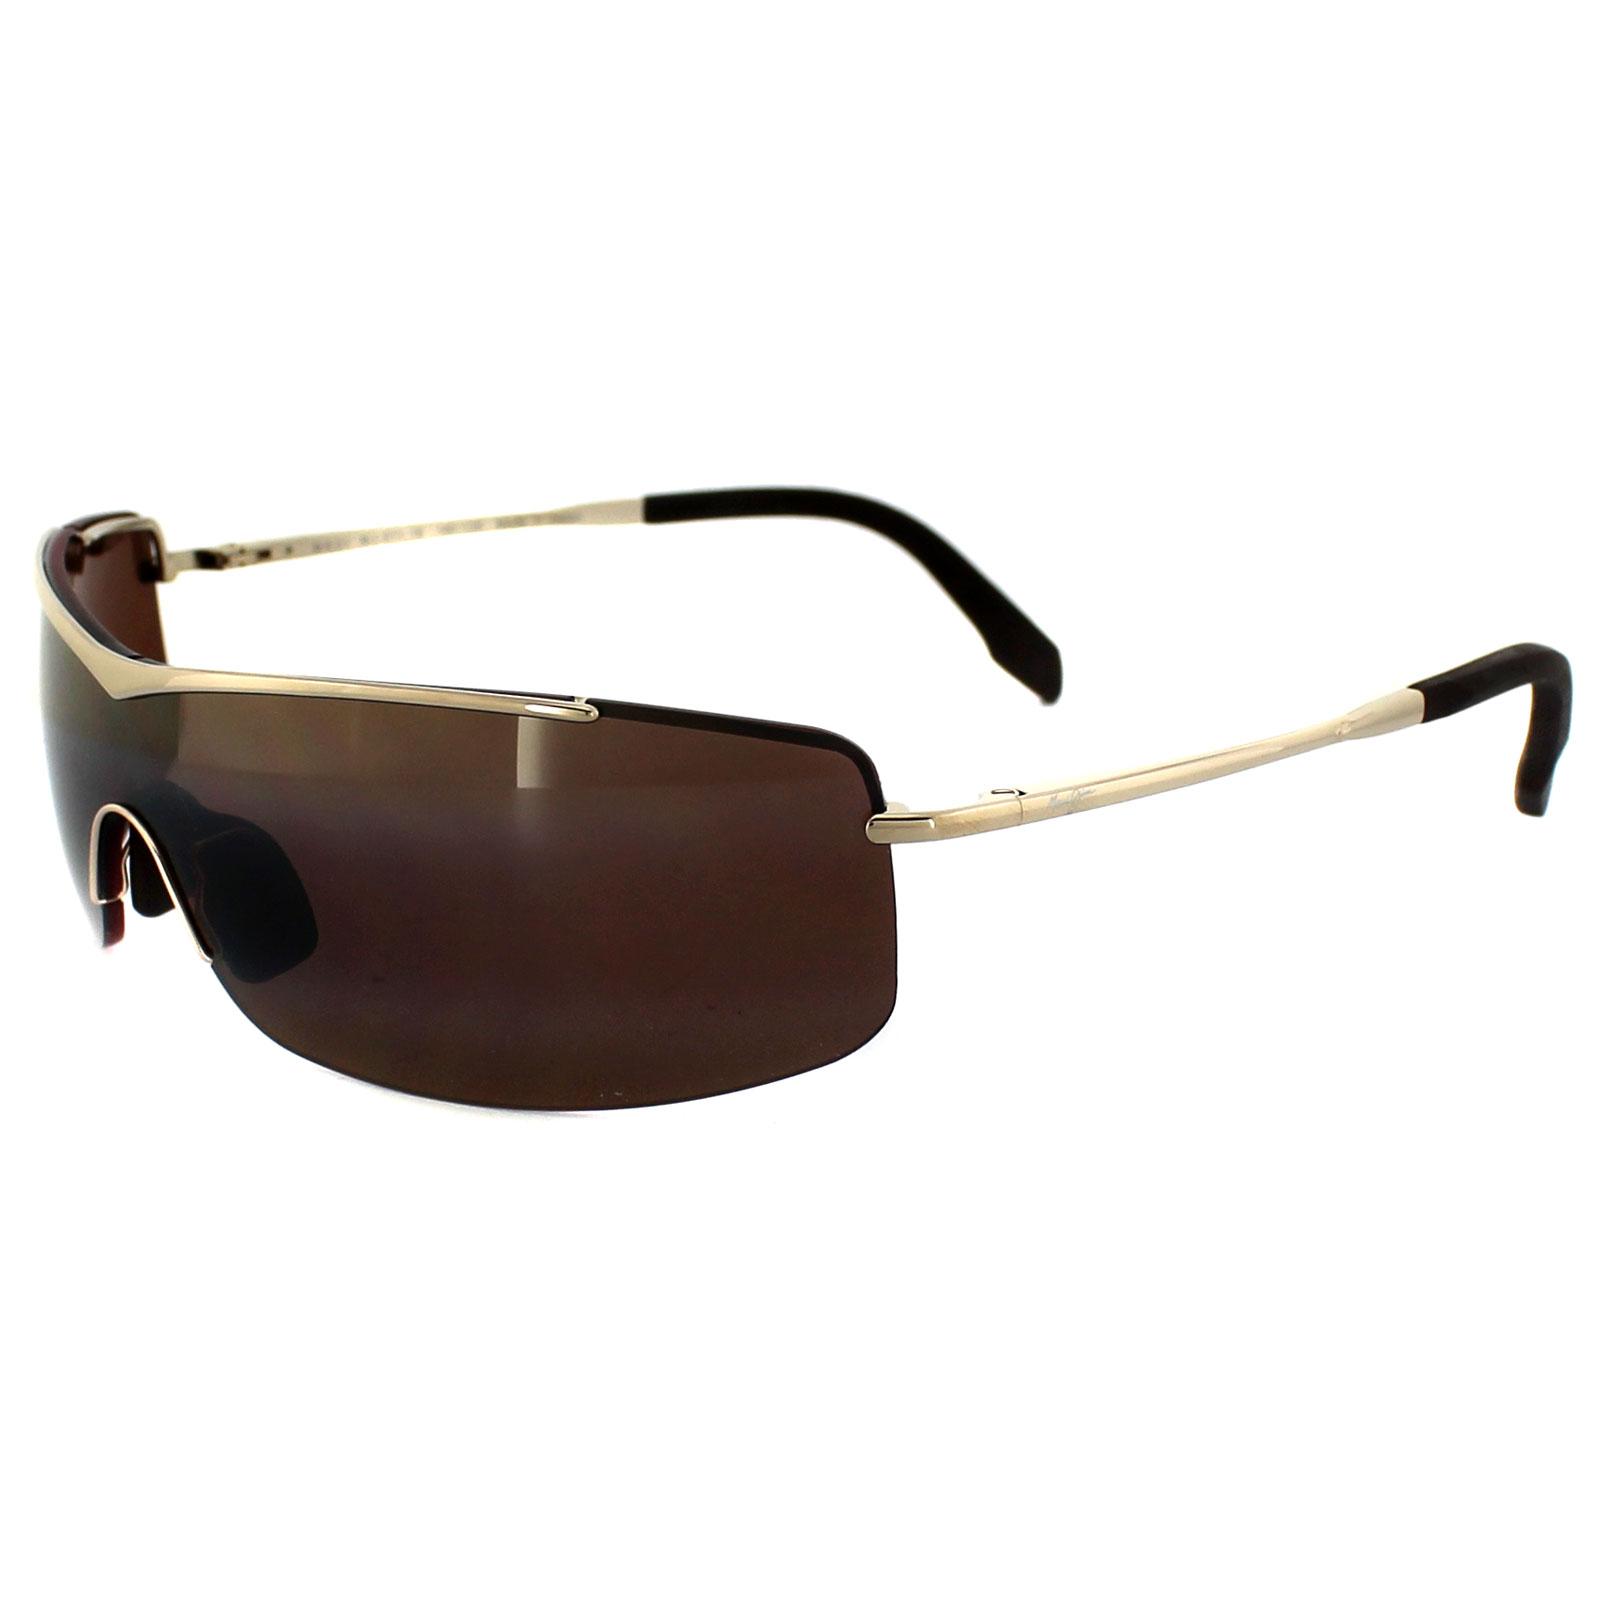 462cf6f4bd30 Maui Jim Imitation Sunglasses Ebay Uk